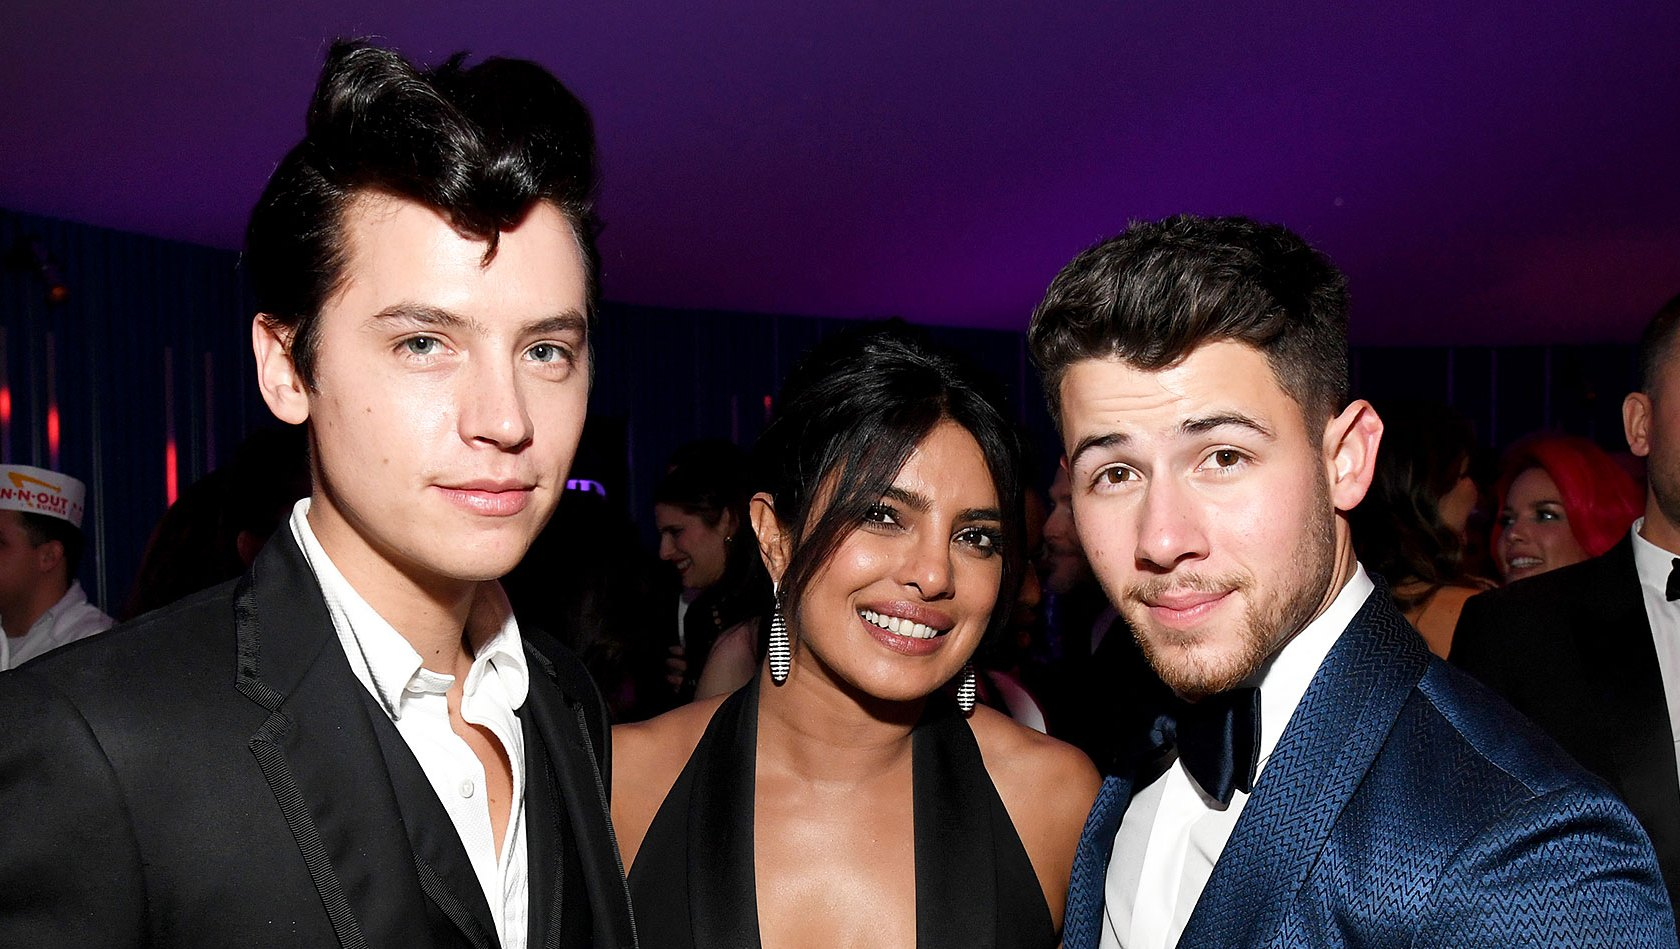 Oscars 2019 Afterparty Cole Sprouse Priyanka Chopra Nick Jonas